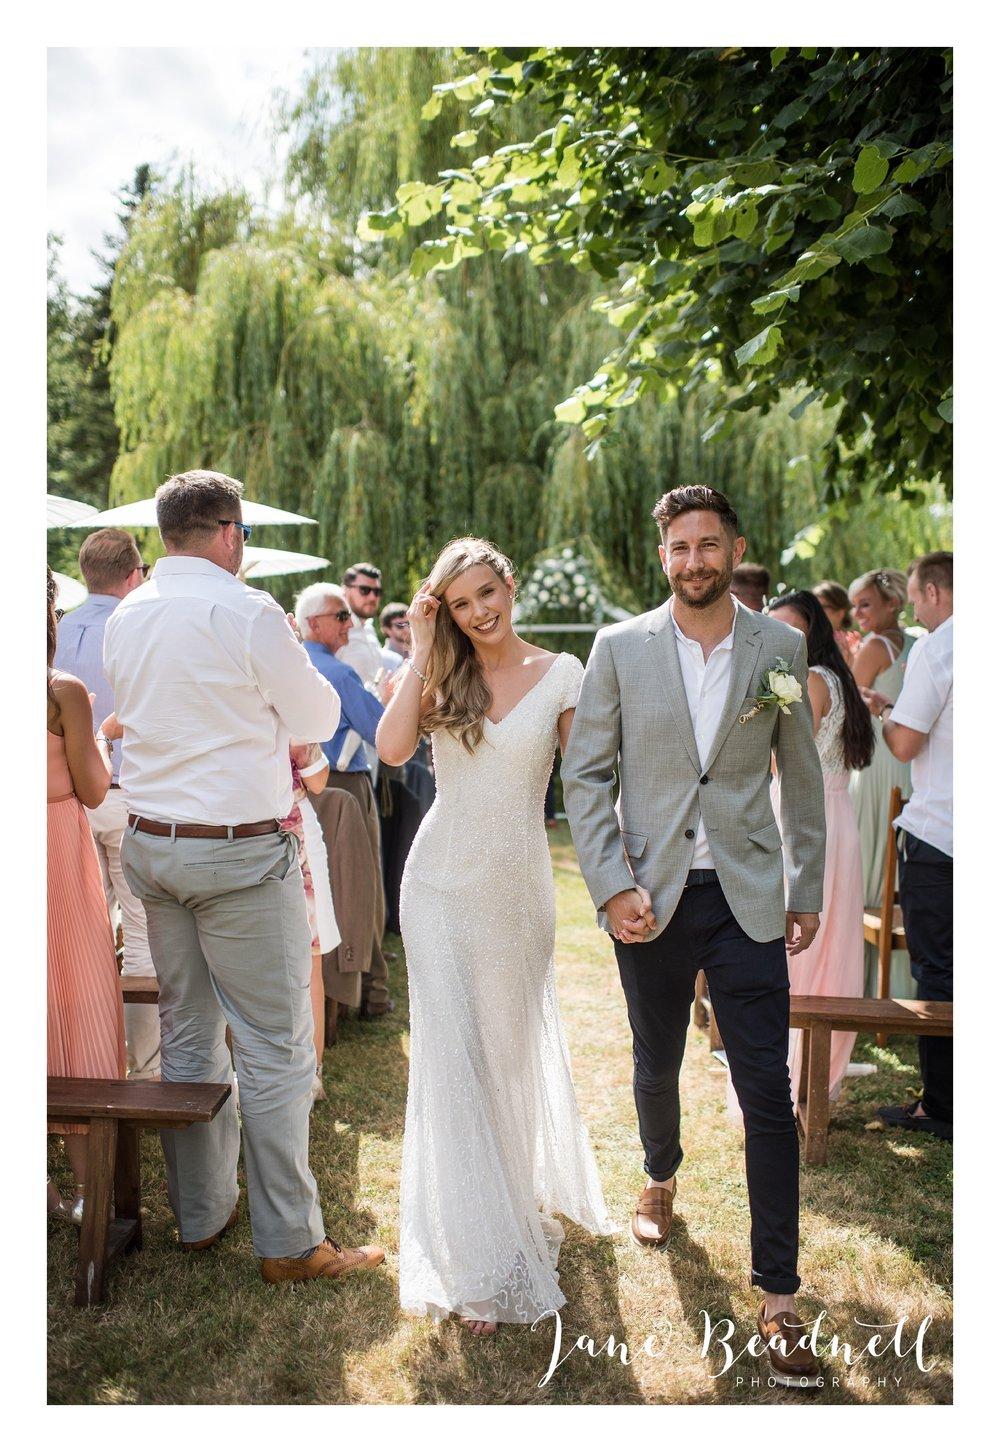 Manoir-de-la-Foulquetière-France-Wedding-Photography-by-UK-Destination-wedding-photographer-Jane-Beadnell-_0094.jpg